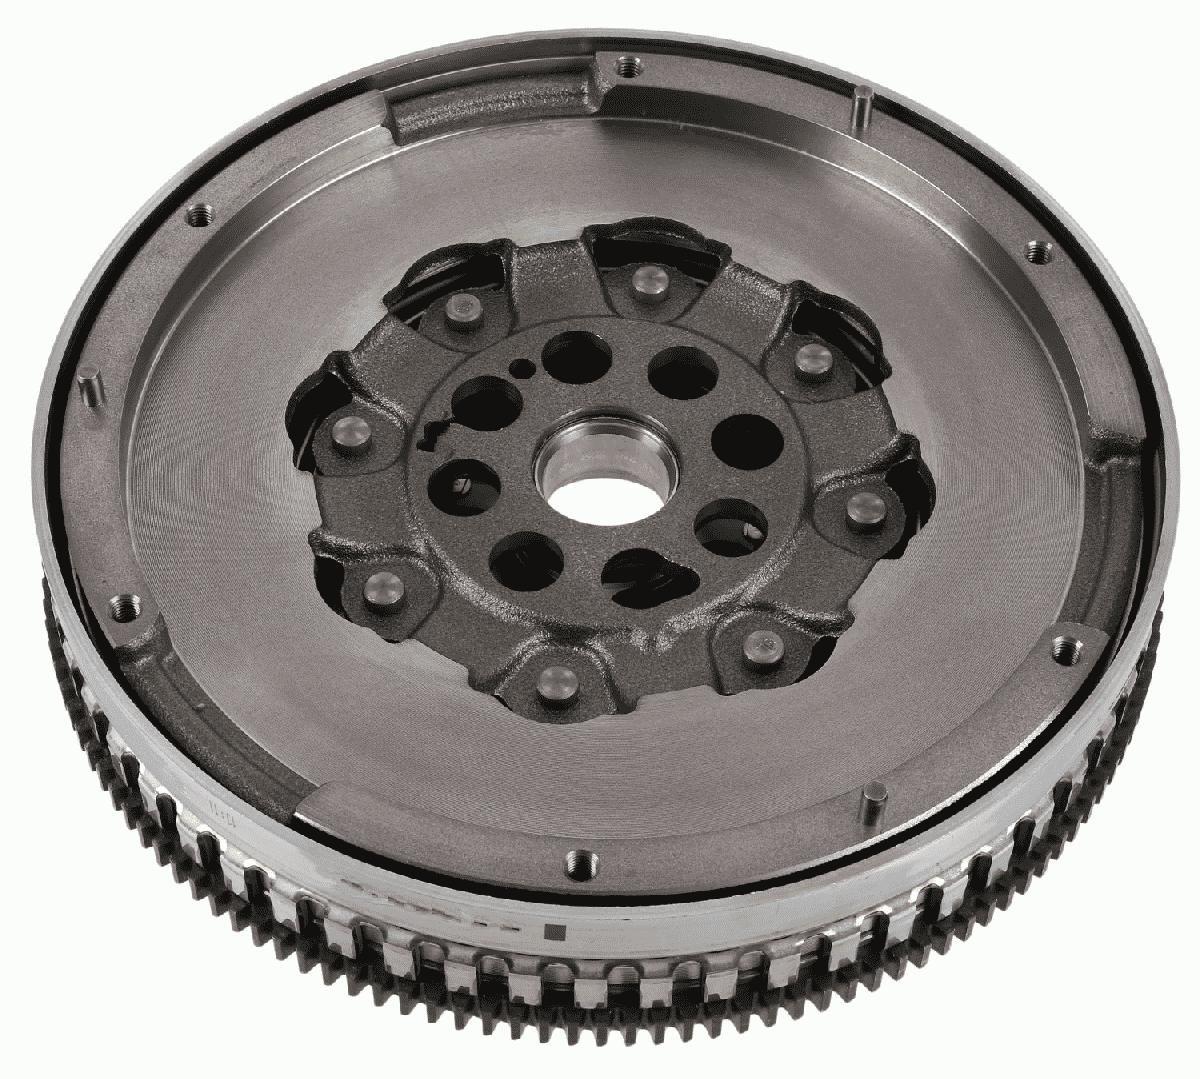 Nissan NV300 2019 Gearbox SACHS 2294 501 214: Ø: 240mm